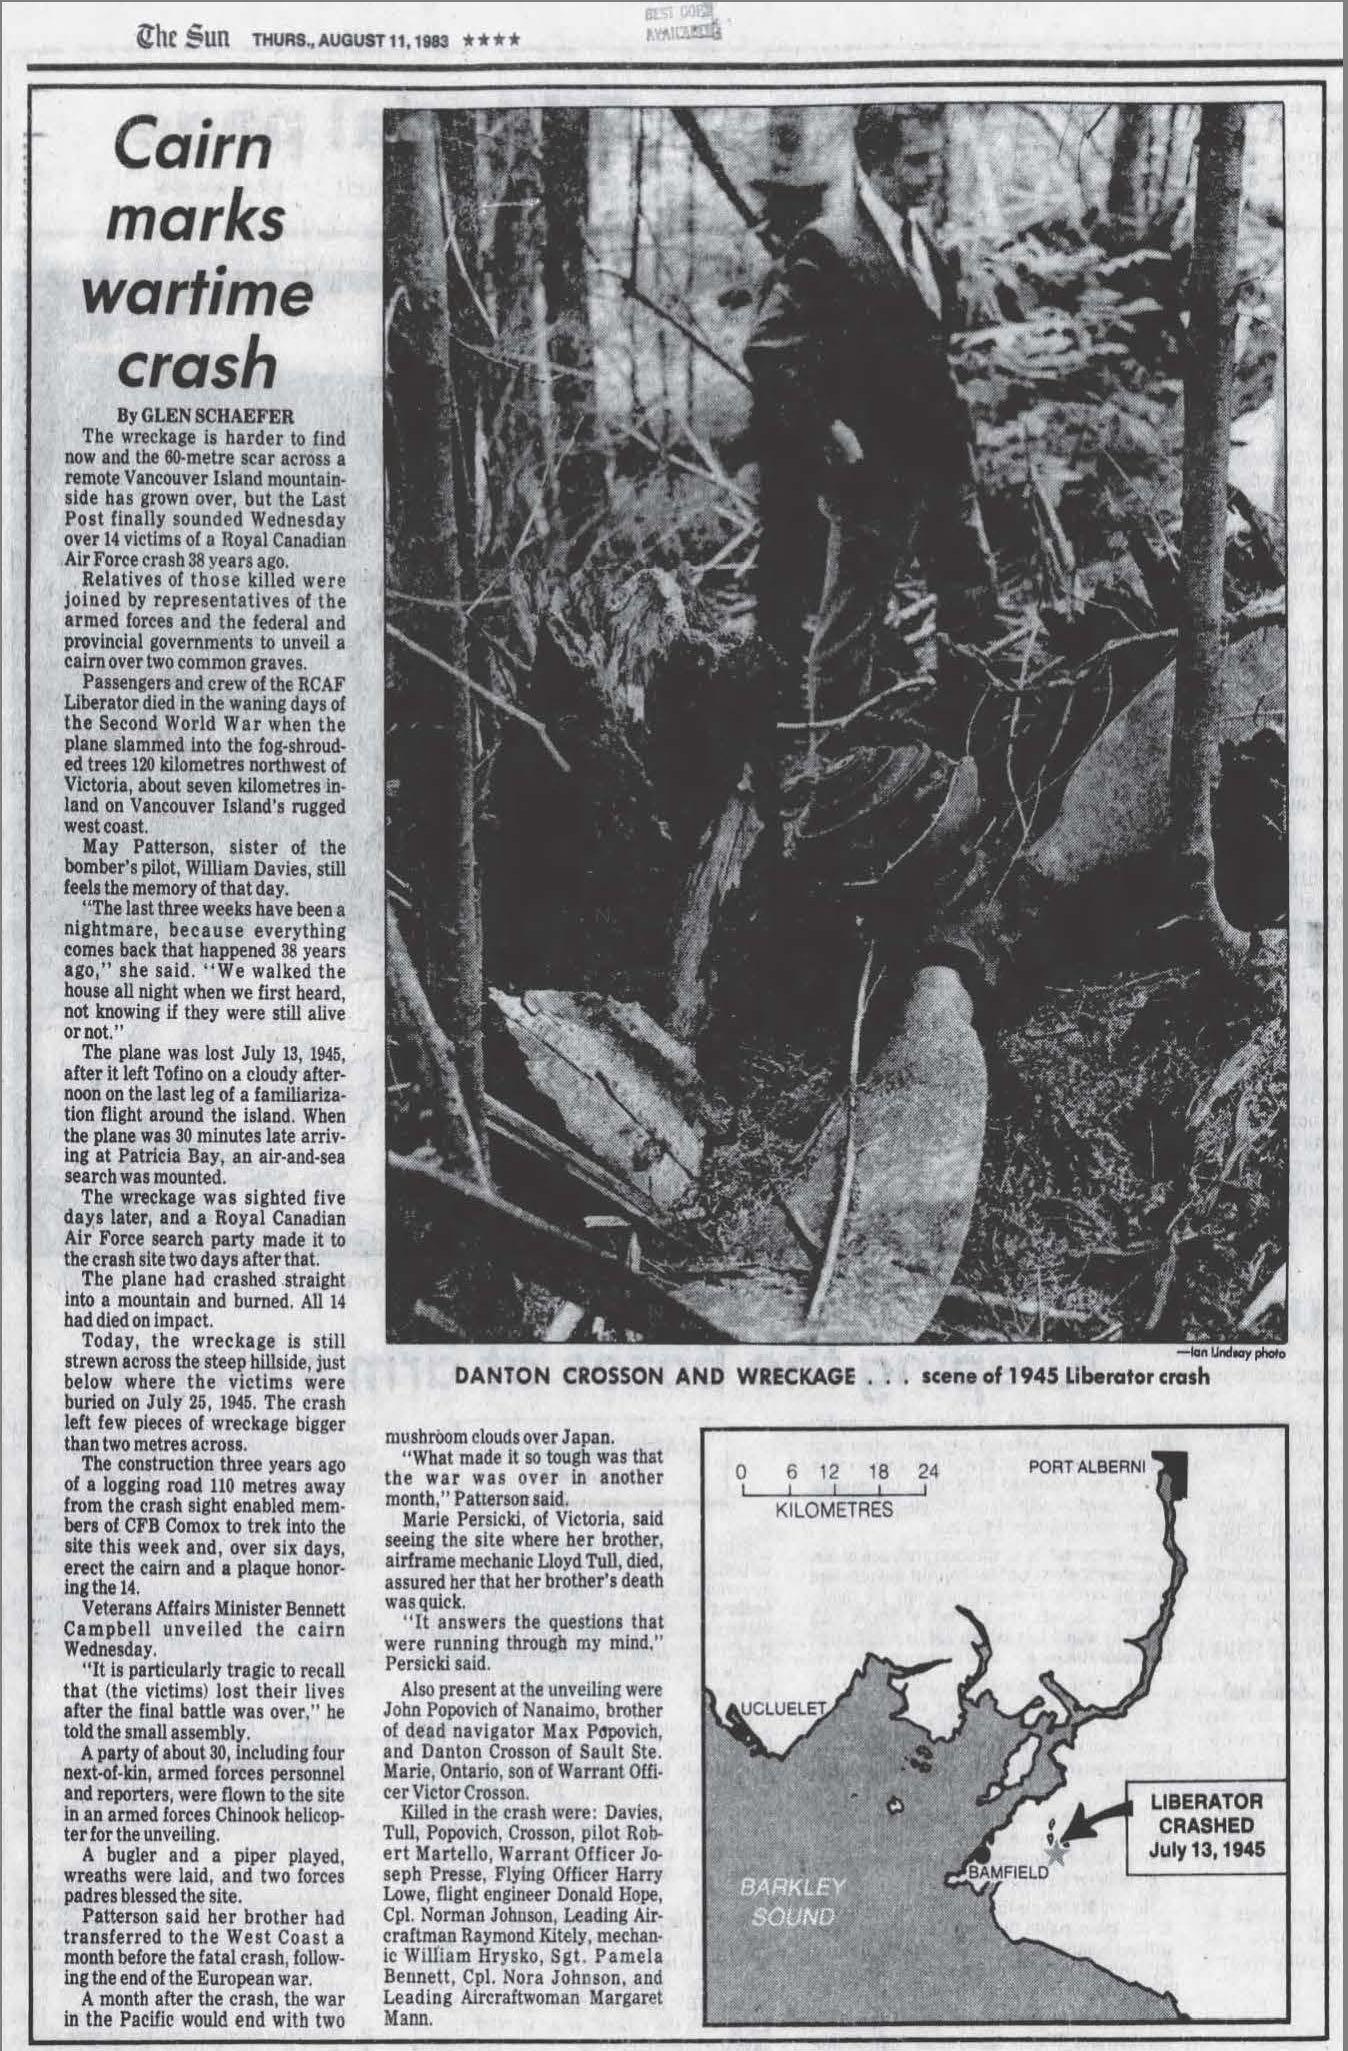 Newspaper clipping– Vancouver Sun, August 11, 1983  For more information, please visit https://bcam.net/wp-content/uploads/2018/11/Presse-JB.pdf